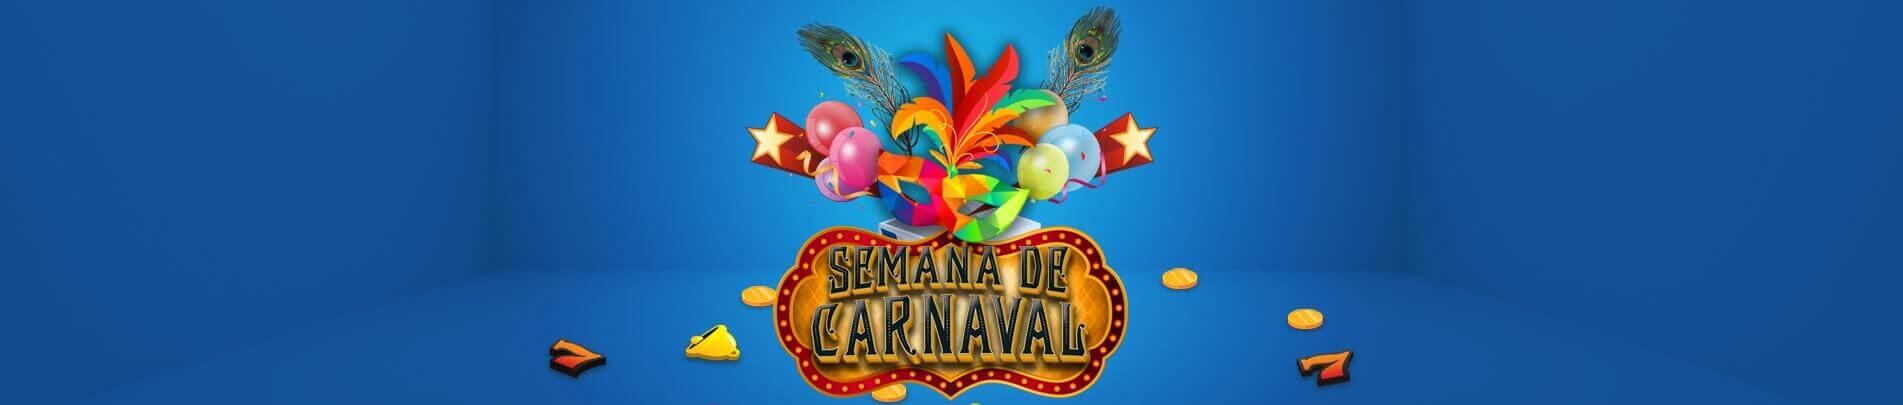 promocion casino semana carnaval casino barcelona